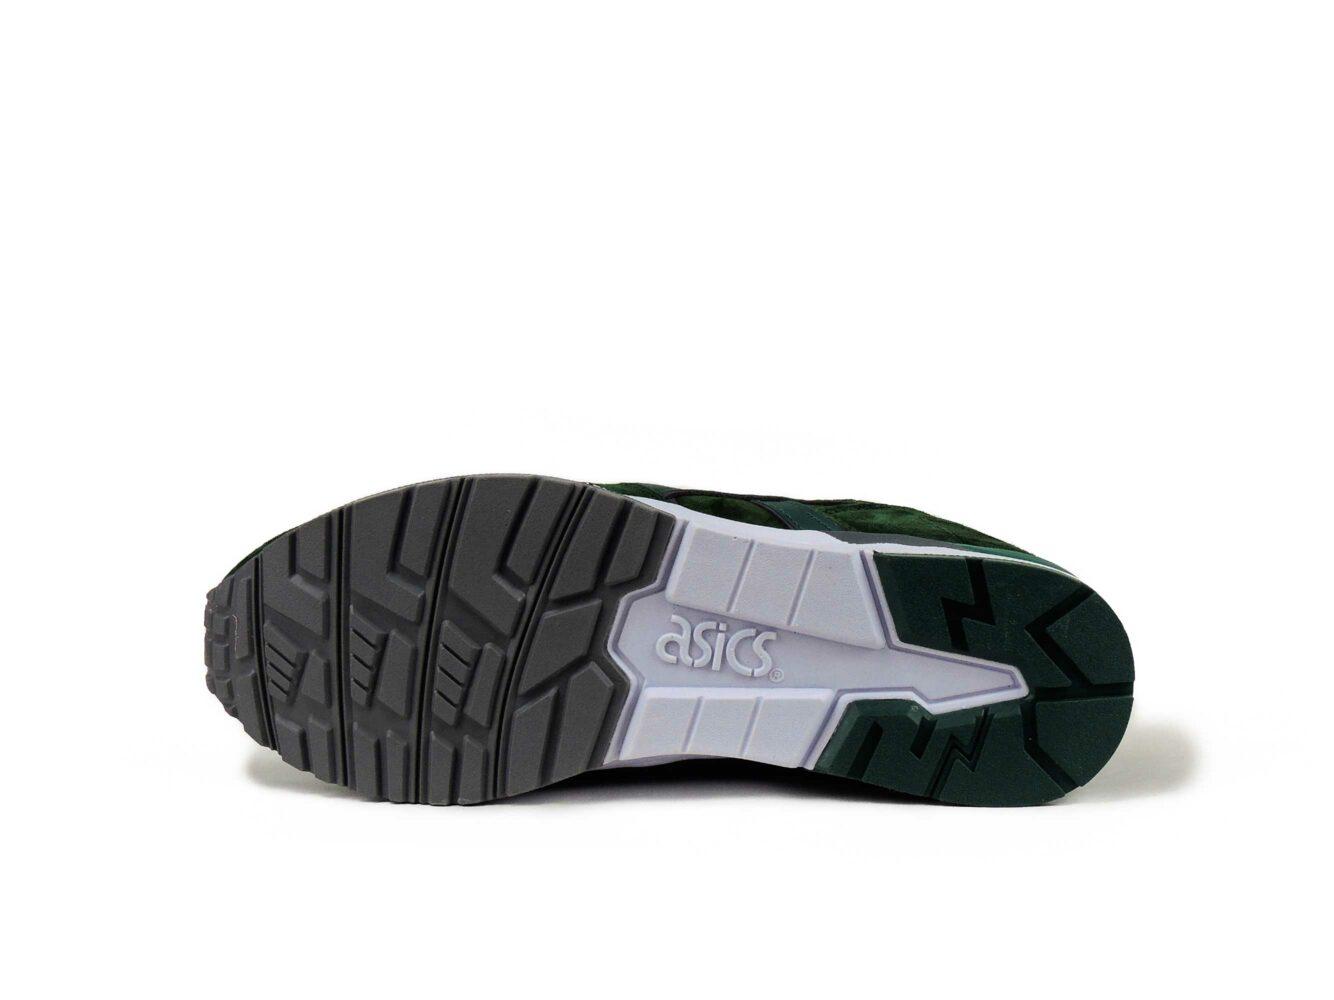 asics gel-lyte 5 green winter H5D2L_8080 купить